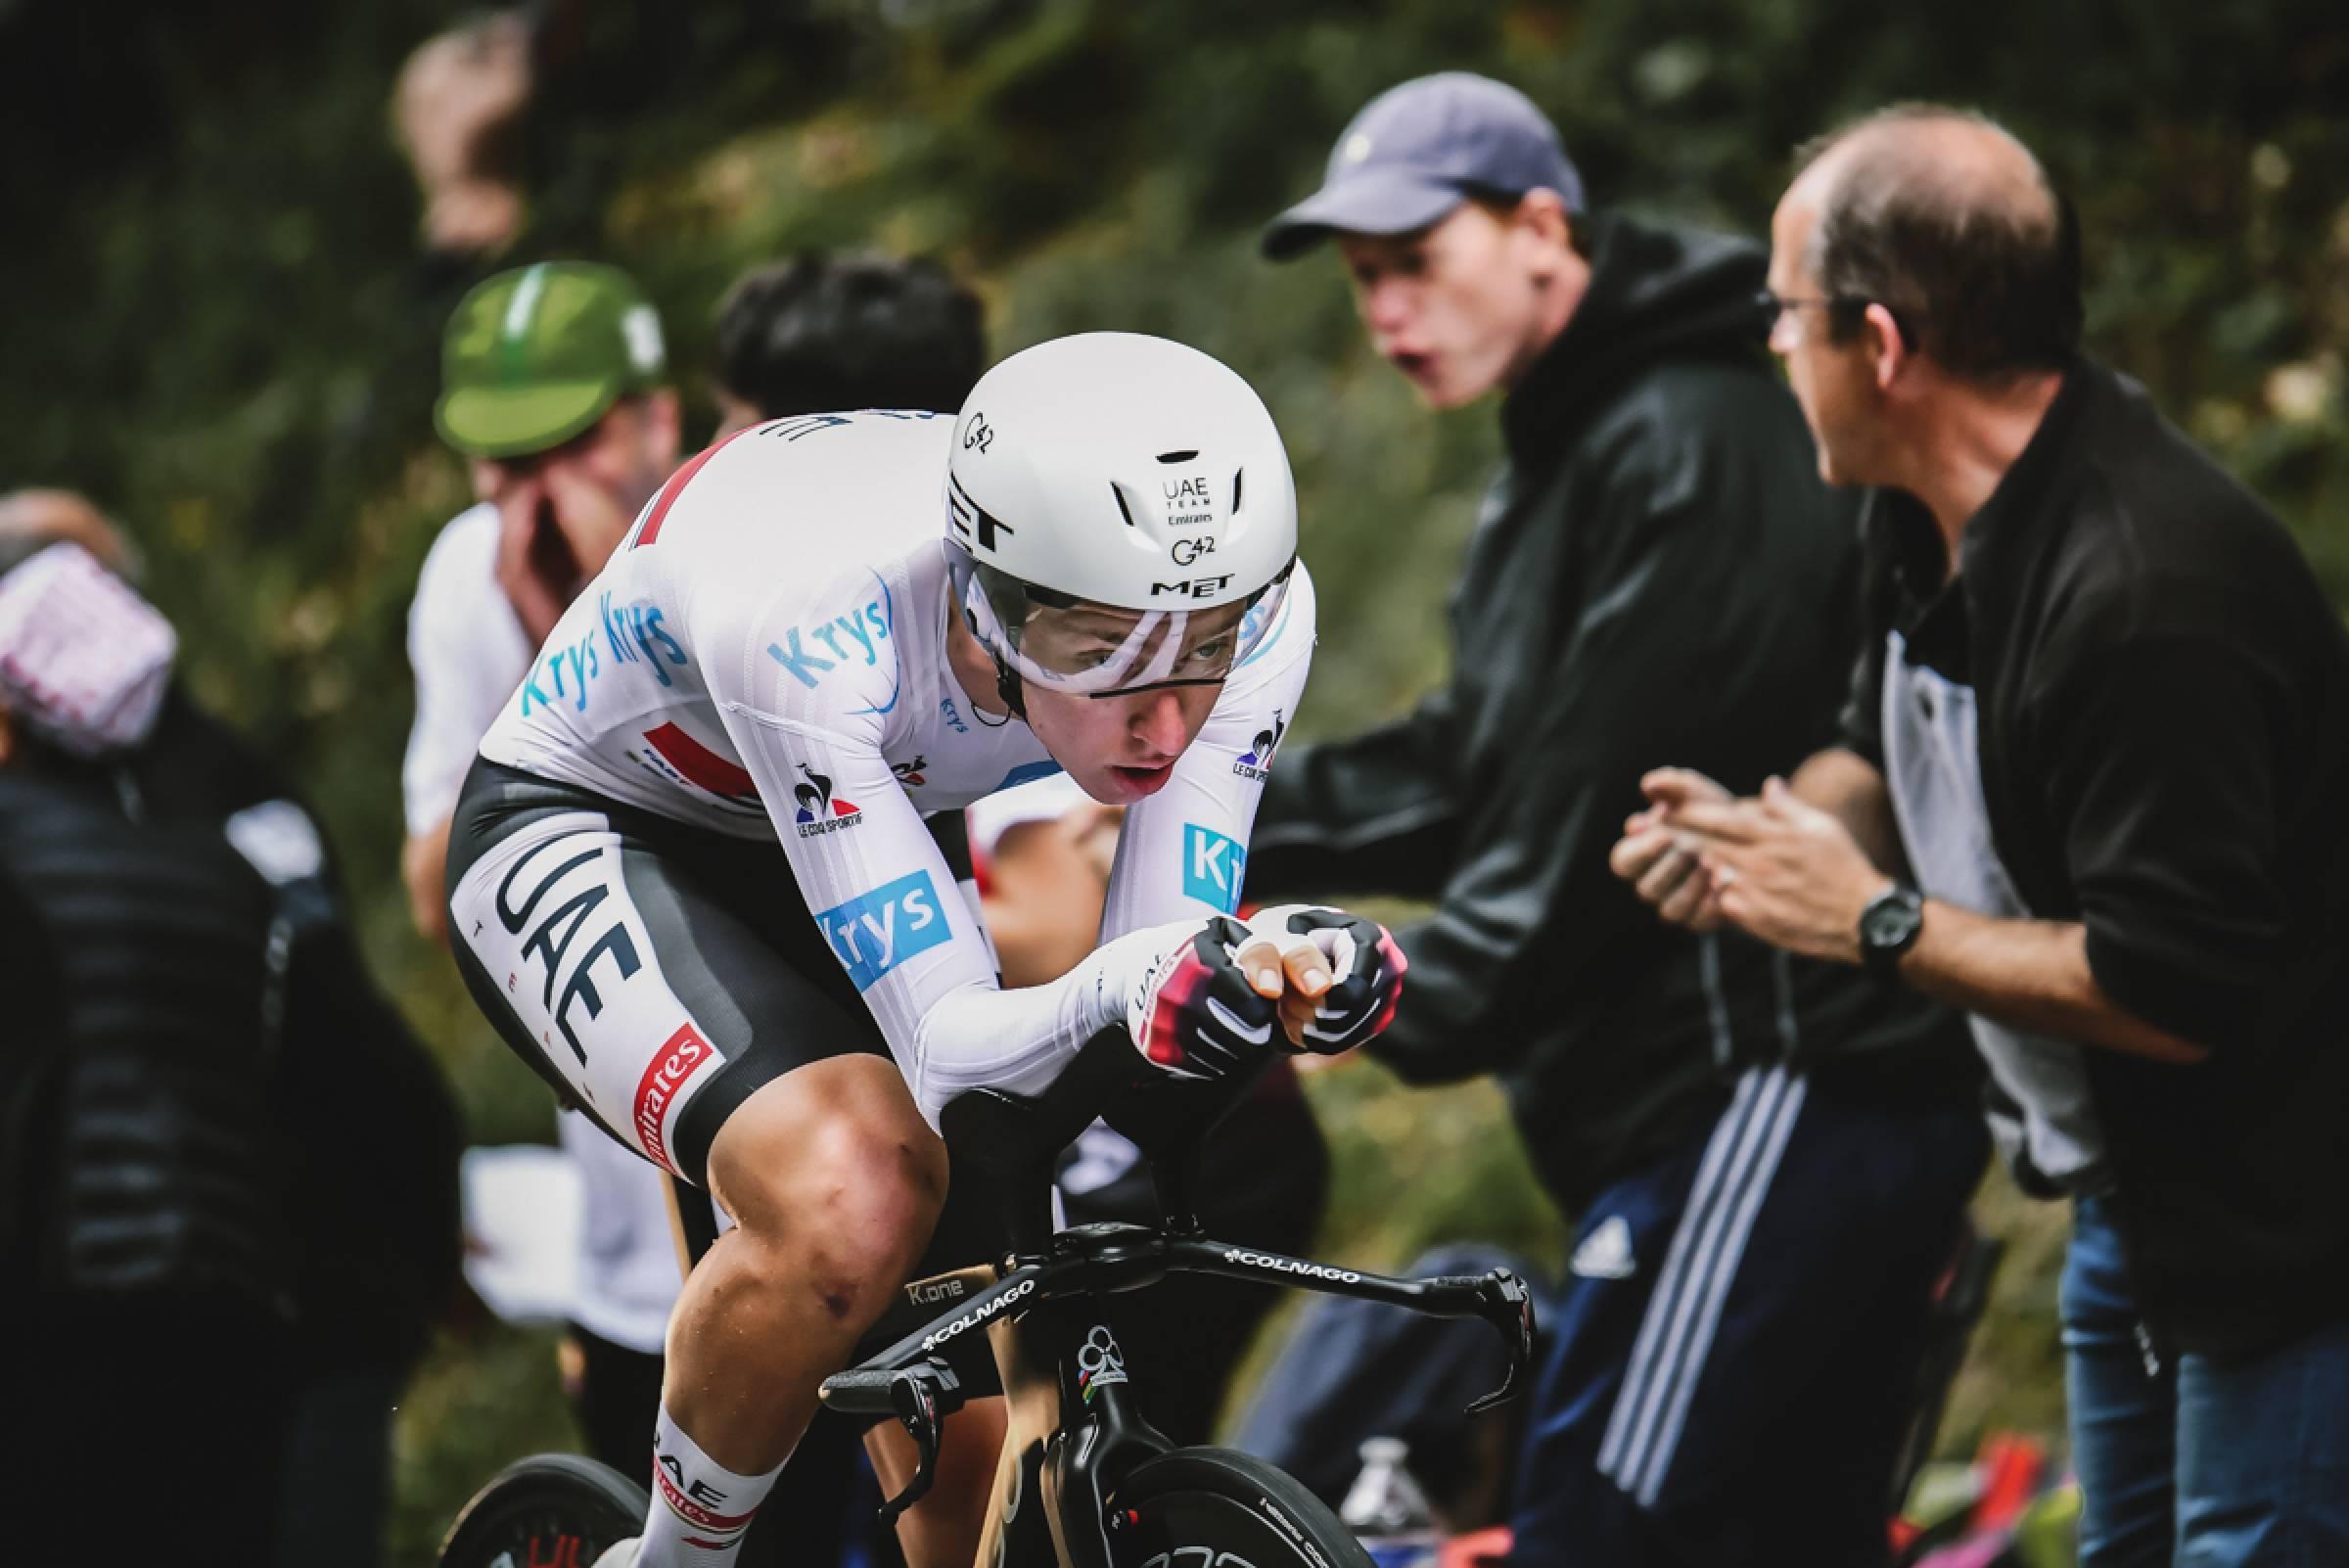 30/06/2021 – Tour de France 2021 – Etape 5 – Changé / Laval (CLM - 27,2 km) - Tadej Pogacar (UAE TEAM EMIRATES)